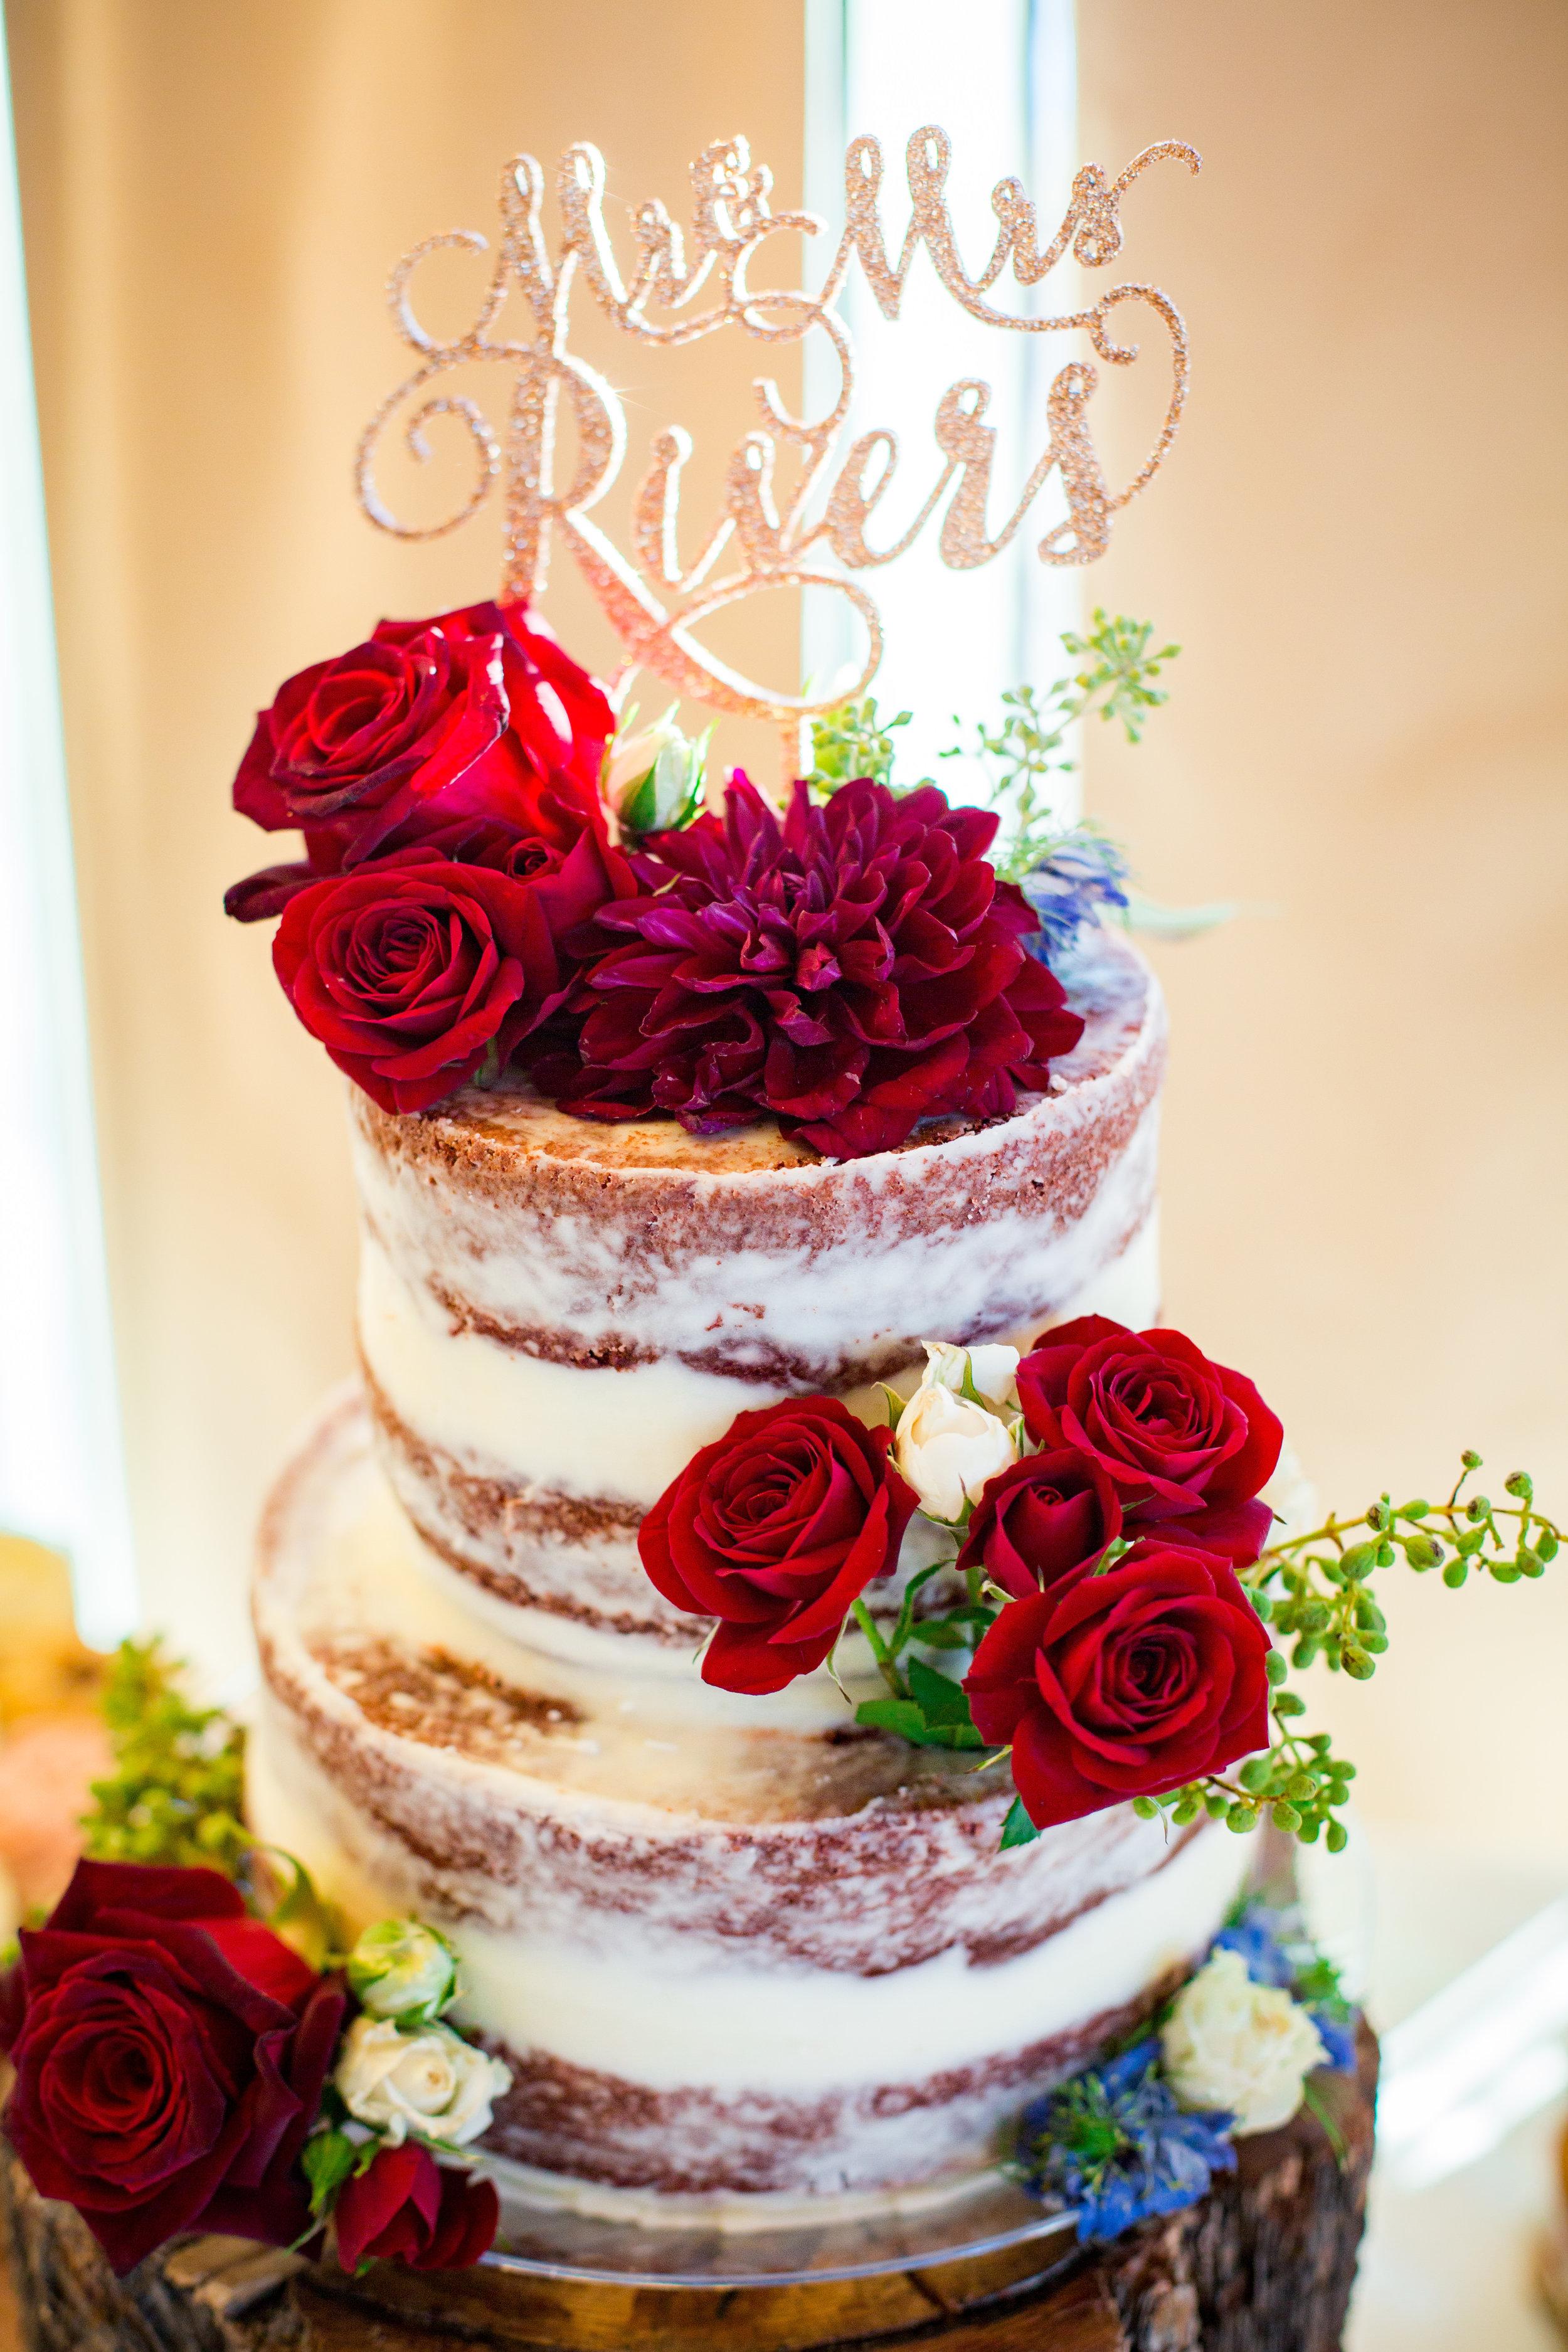 11 Britni & Dennis - Edgewood Tahoe - Sacramento Wedding Photographer - Ashley Teasley Photography-26.JPG